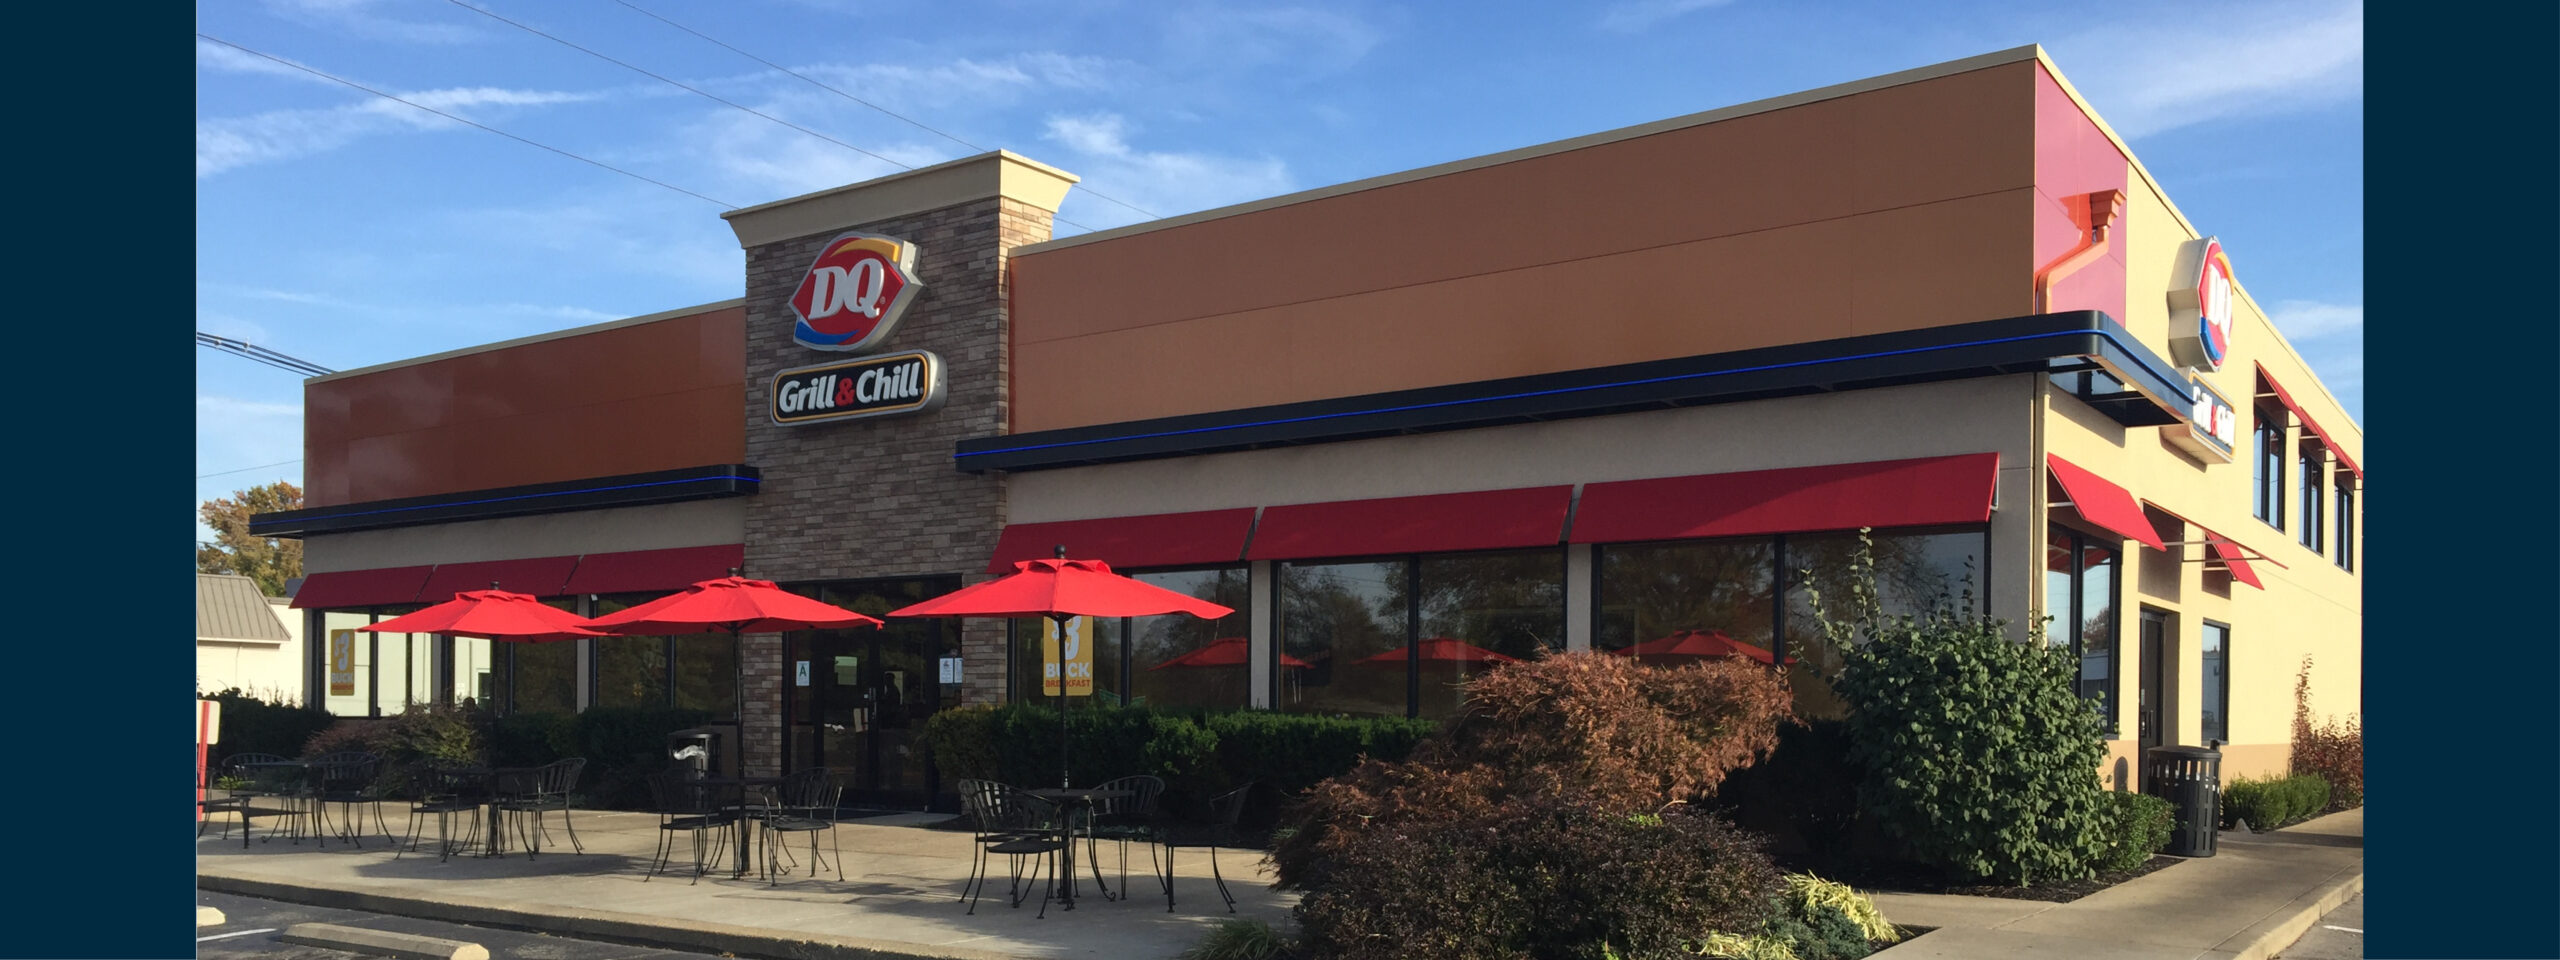 Louisville, KY Fourteen Foods DQ Restaurant